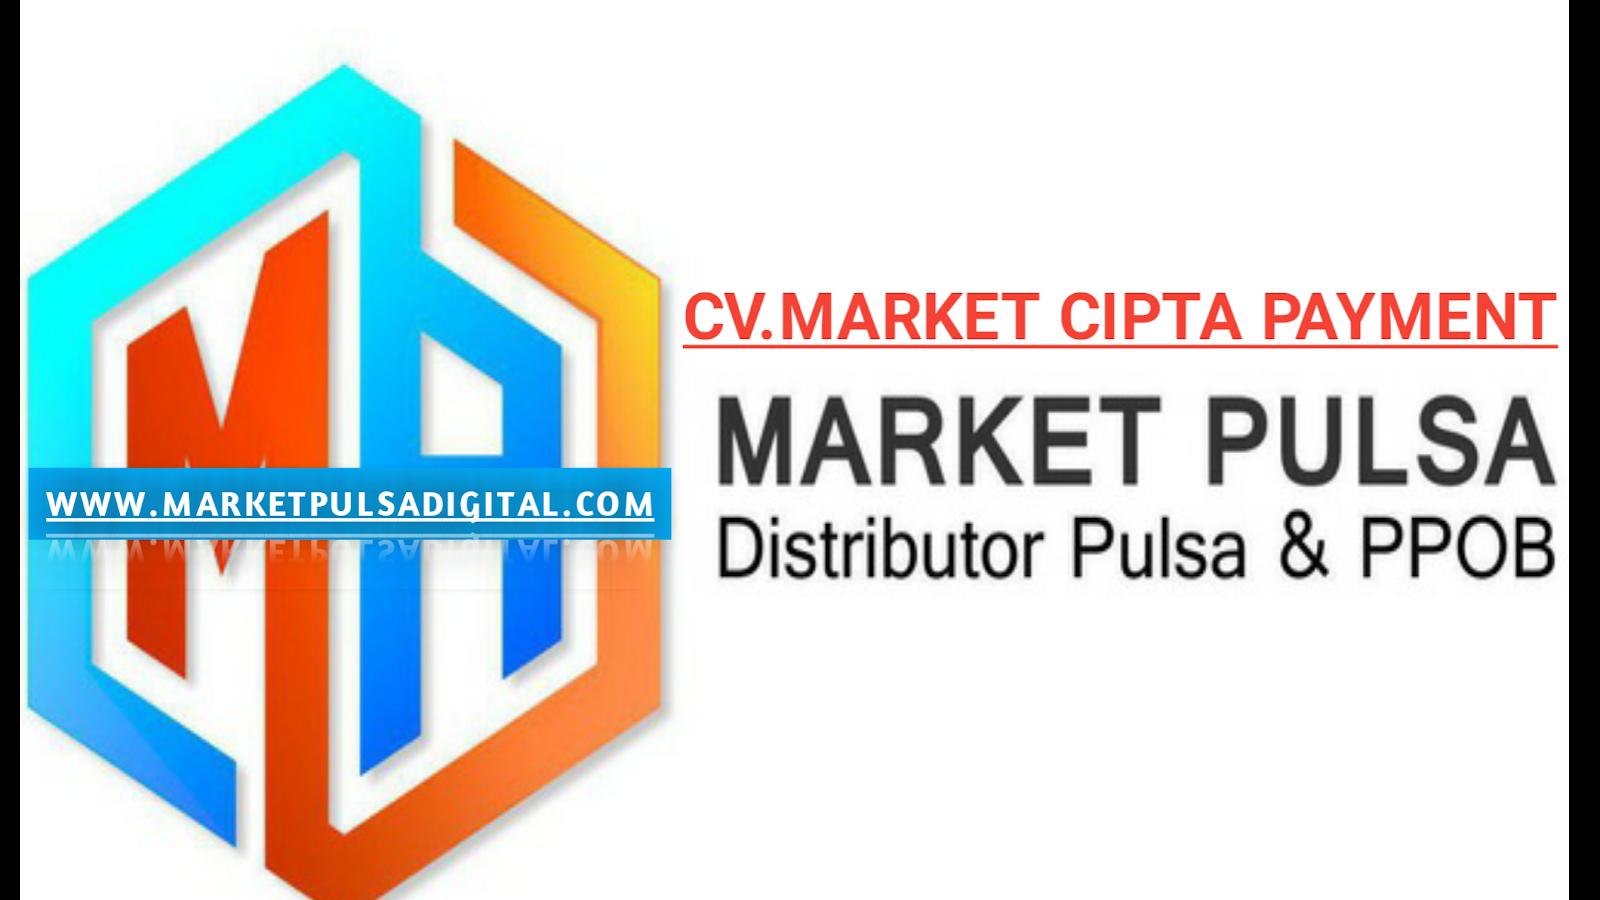 Market Pulsa: Distributor Agen Pulsa dan PPOB | Harga Termurah Untuk Agen